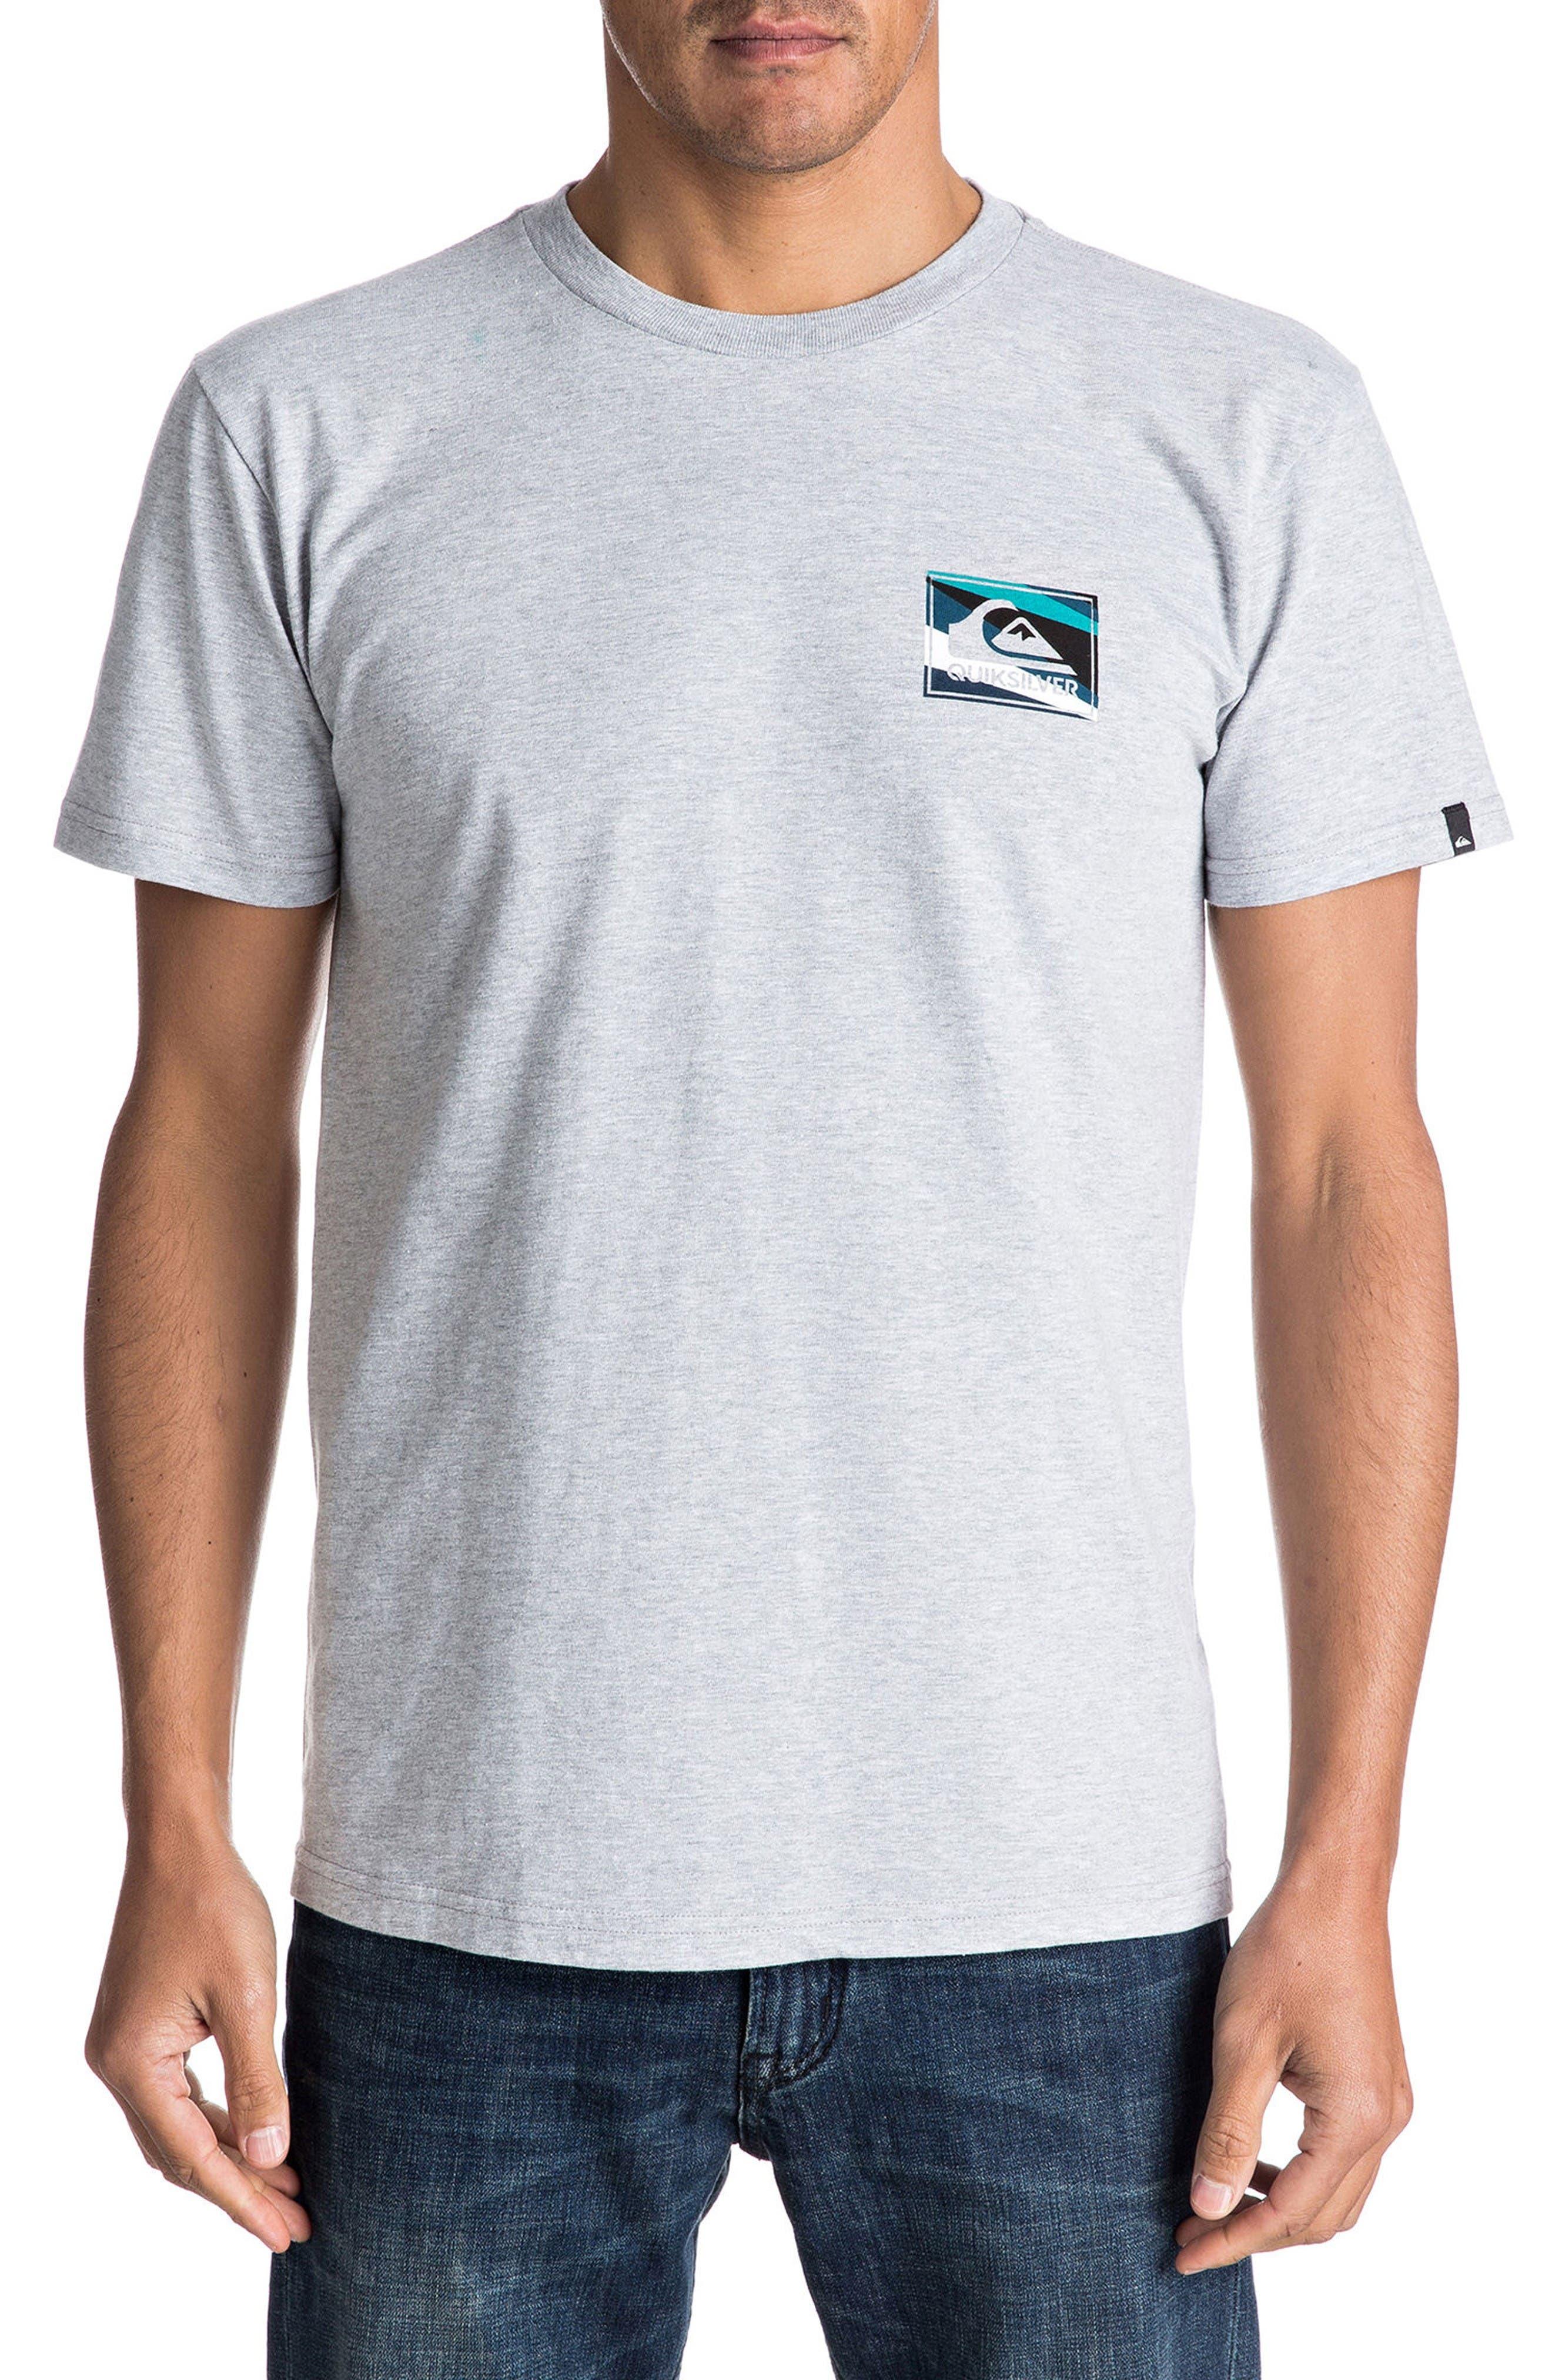 Quiksilver Box Knife Graphic T-Shirt